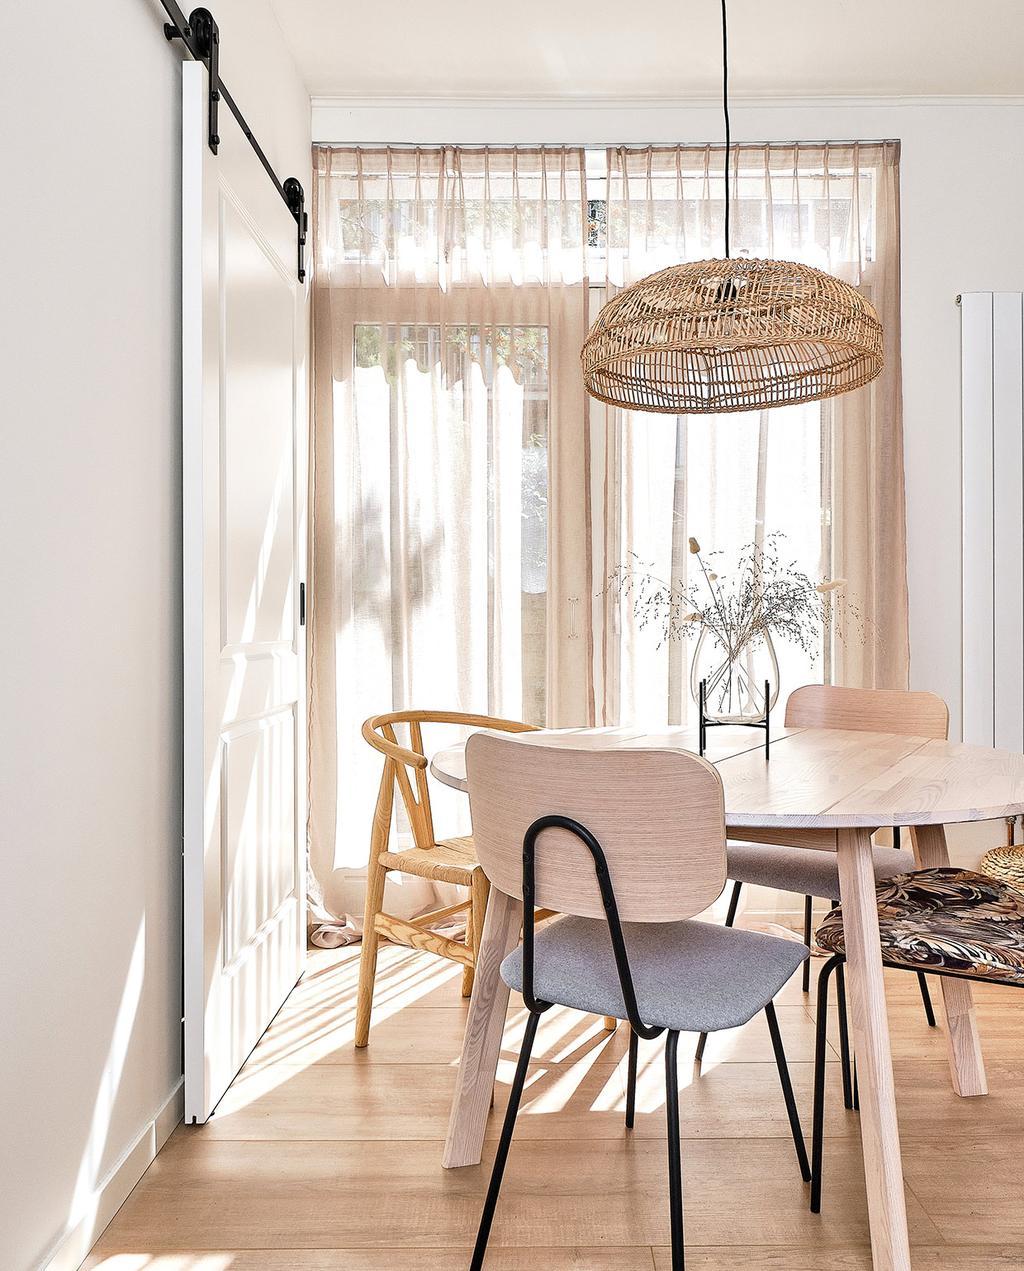 vtwonen special tiny houses | ronde tafel van hout